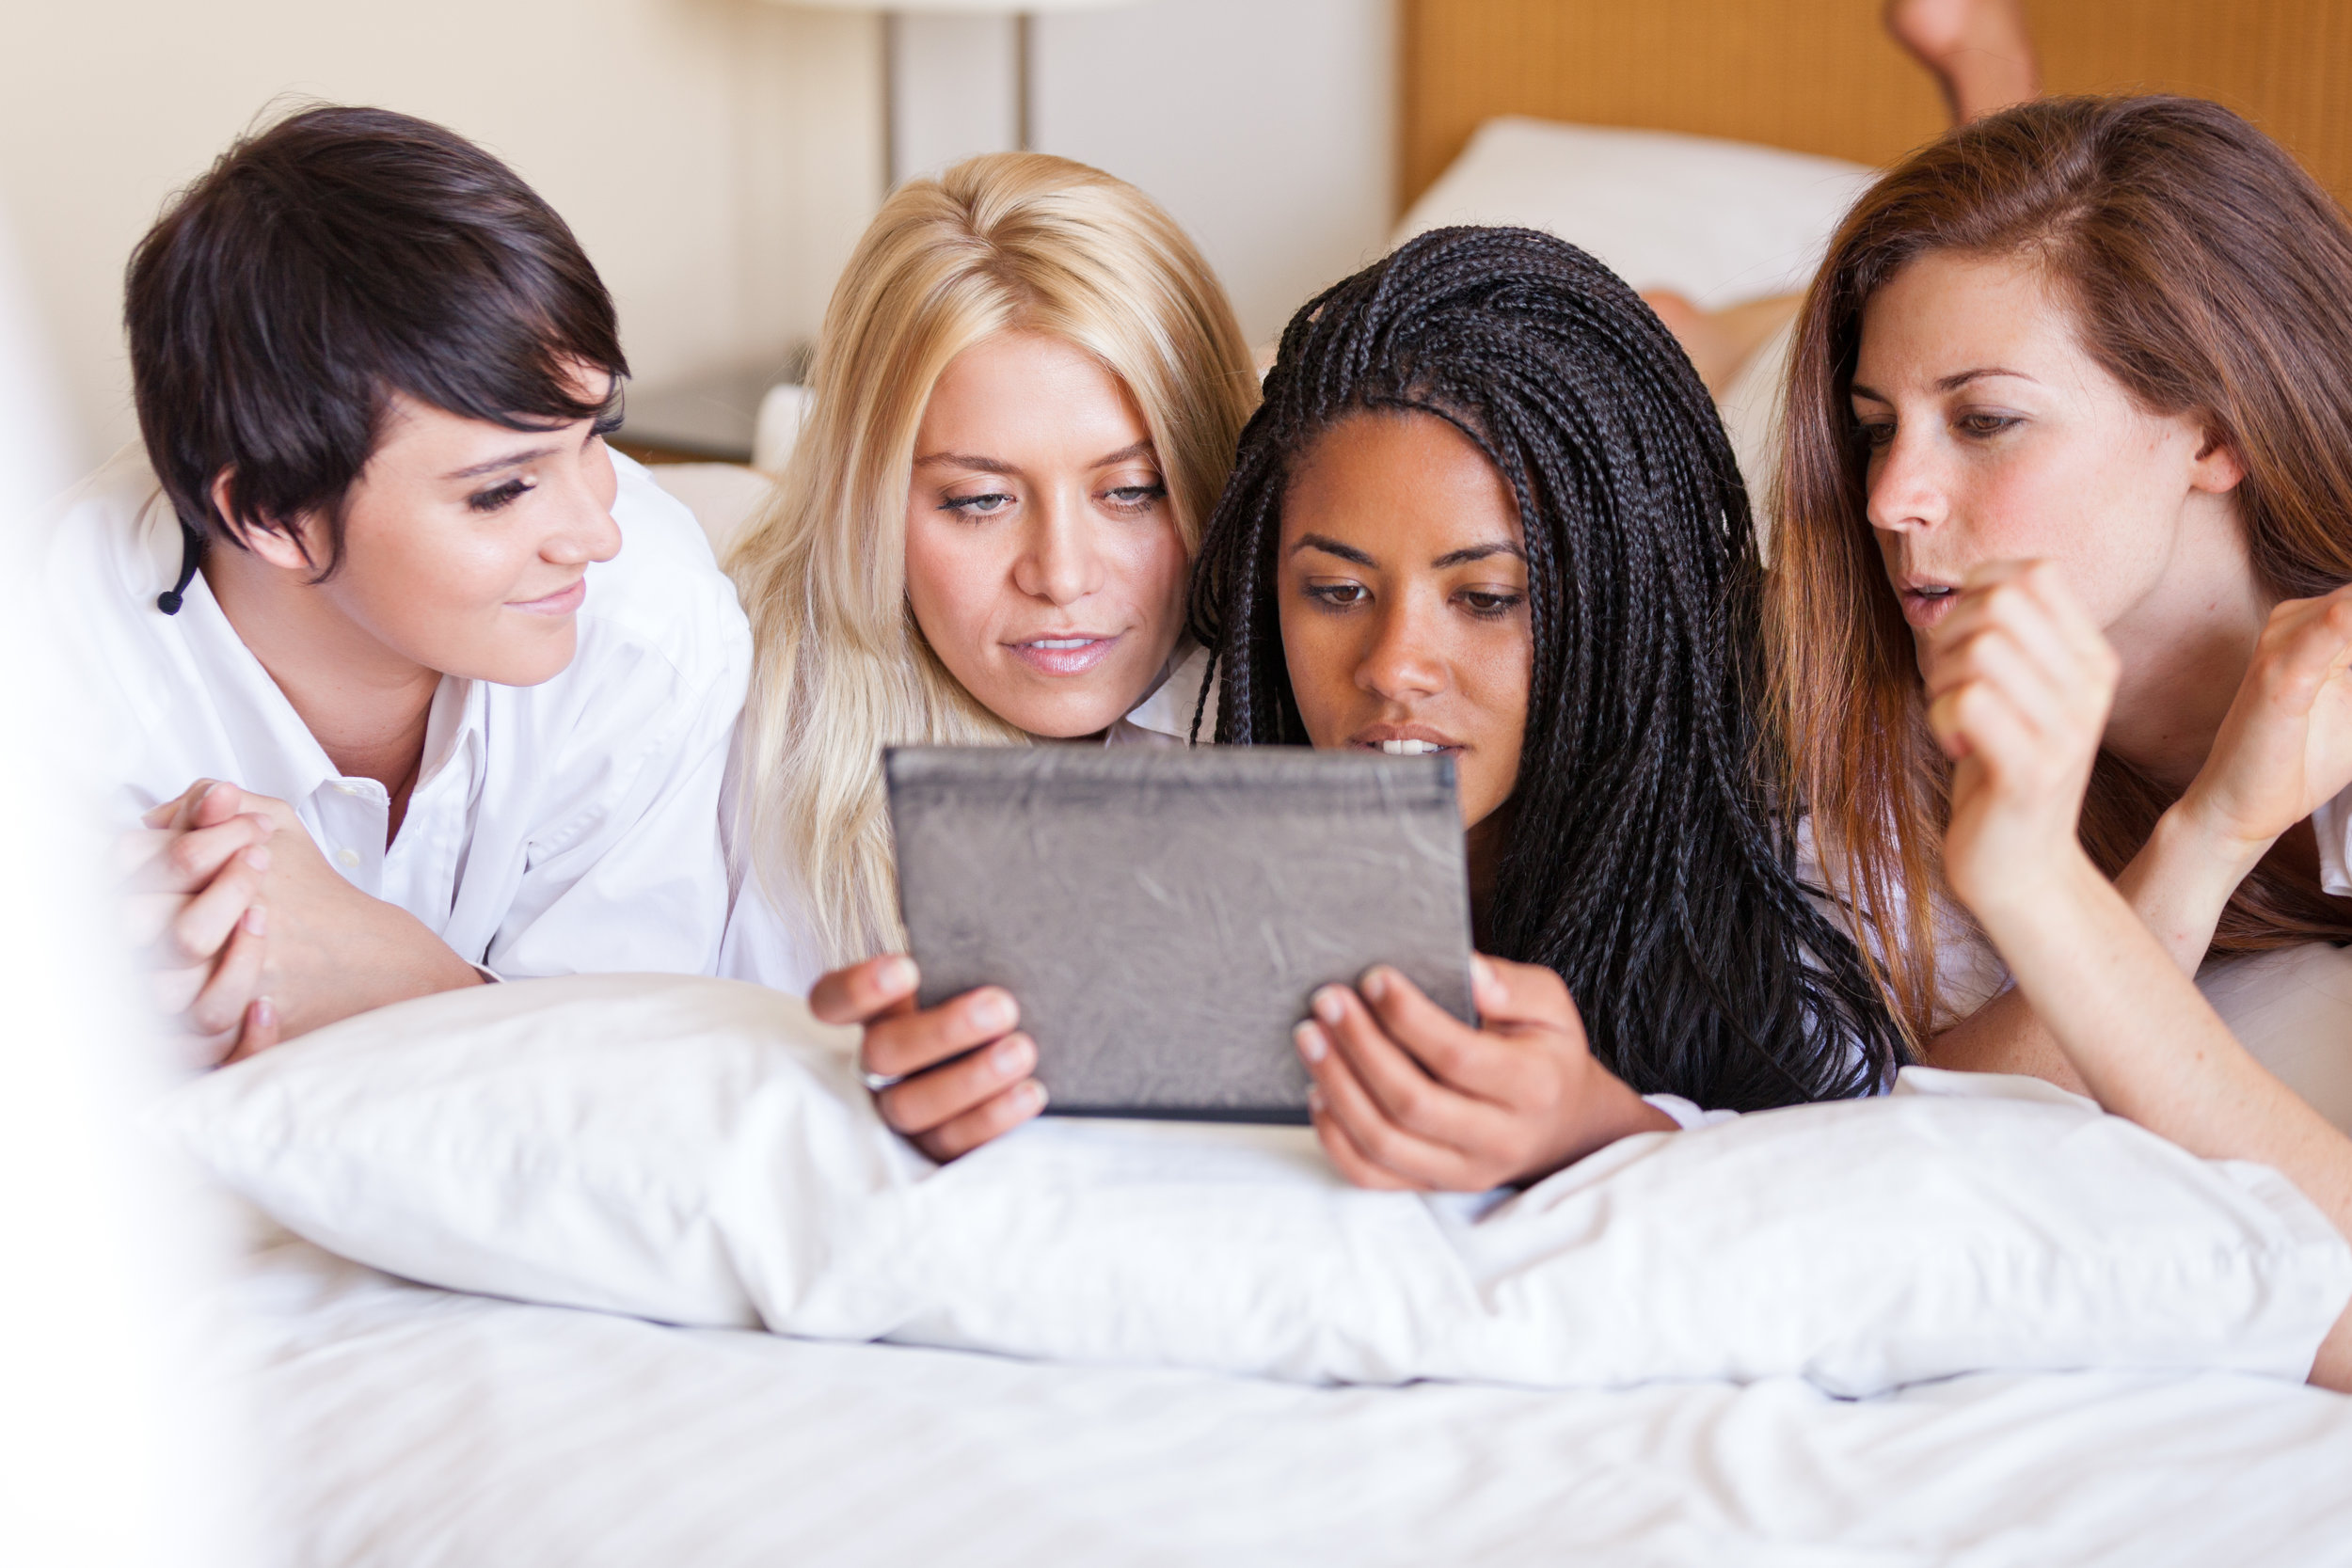 Students in hotel bed Shutter 300 dpi.jpg